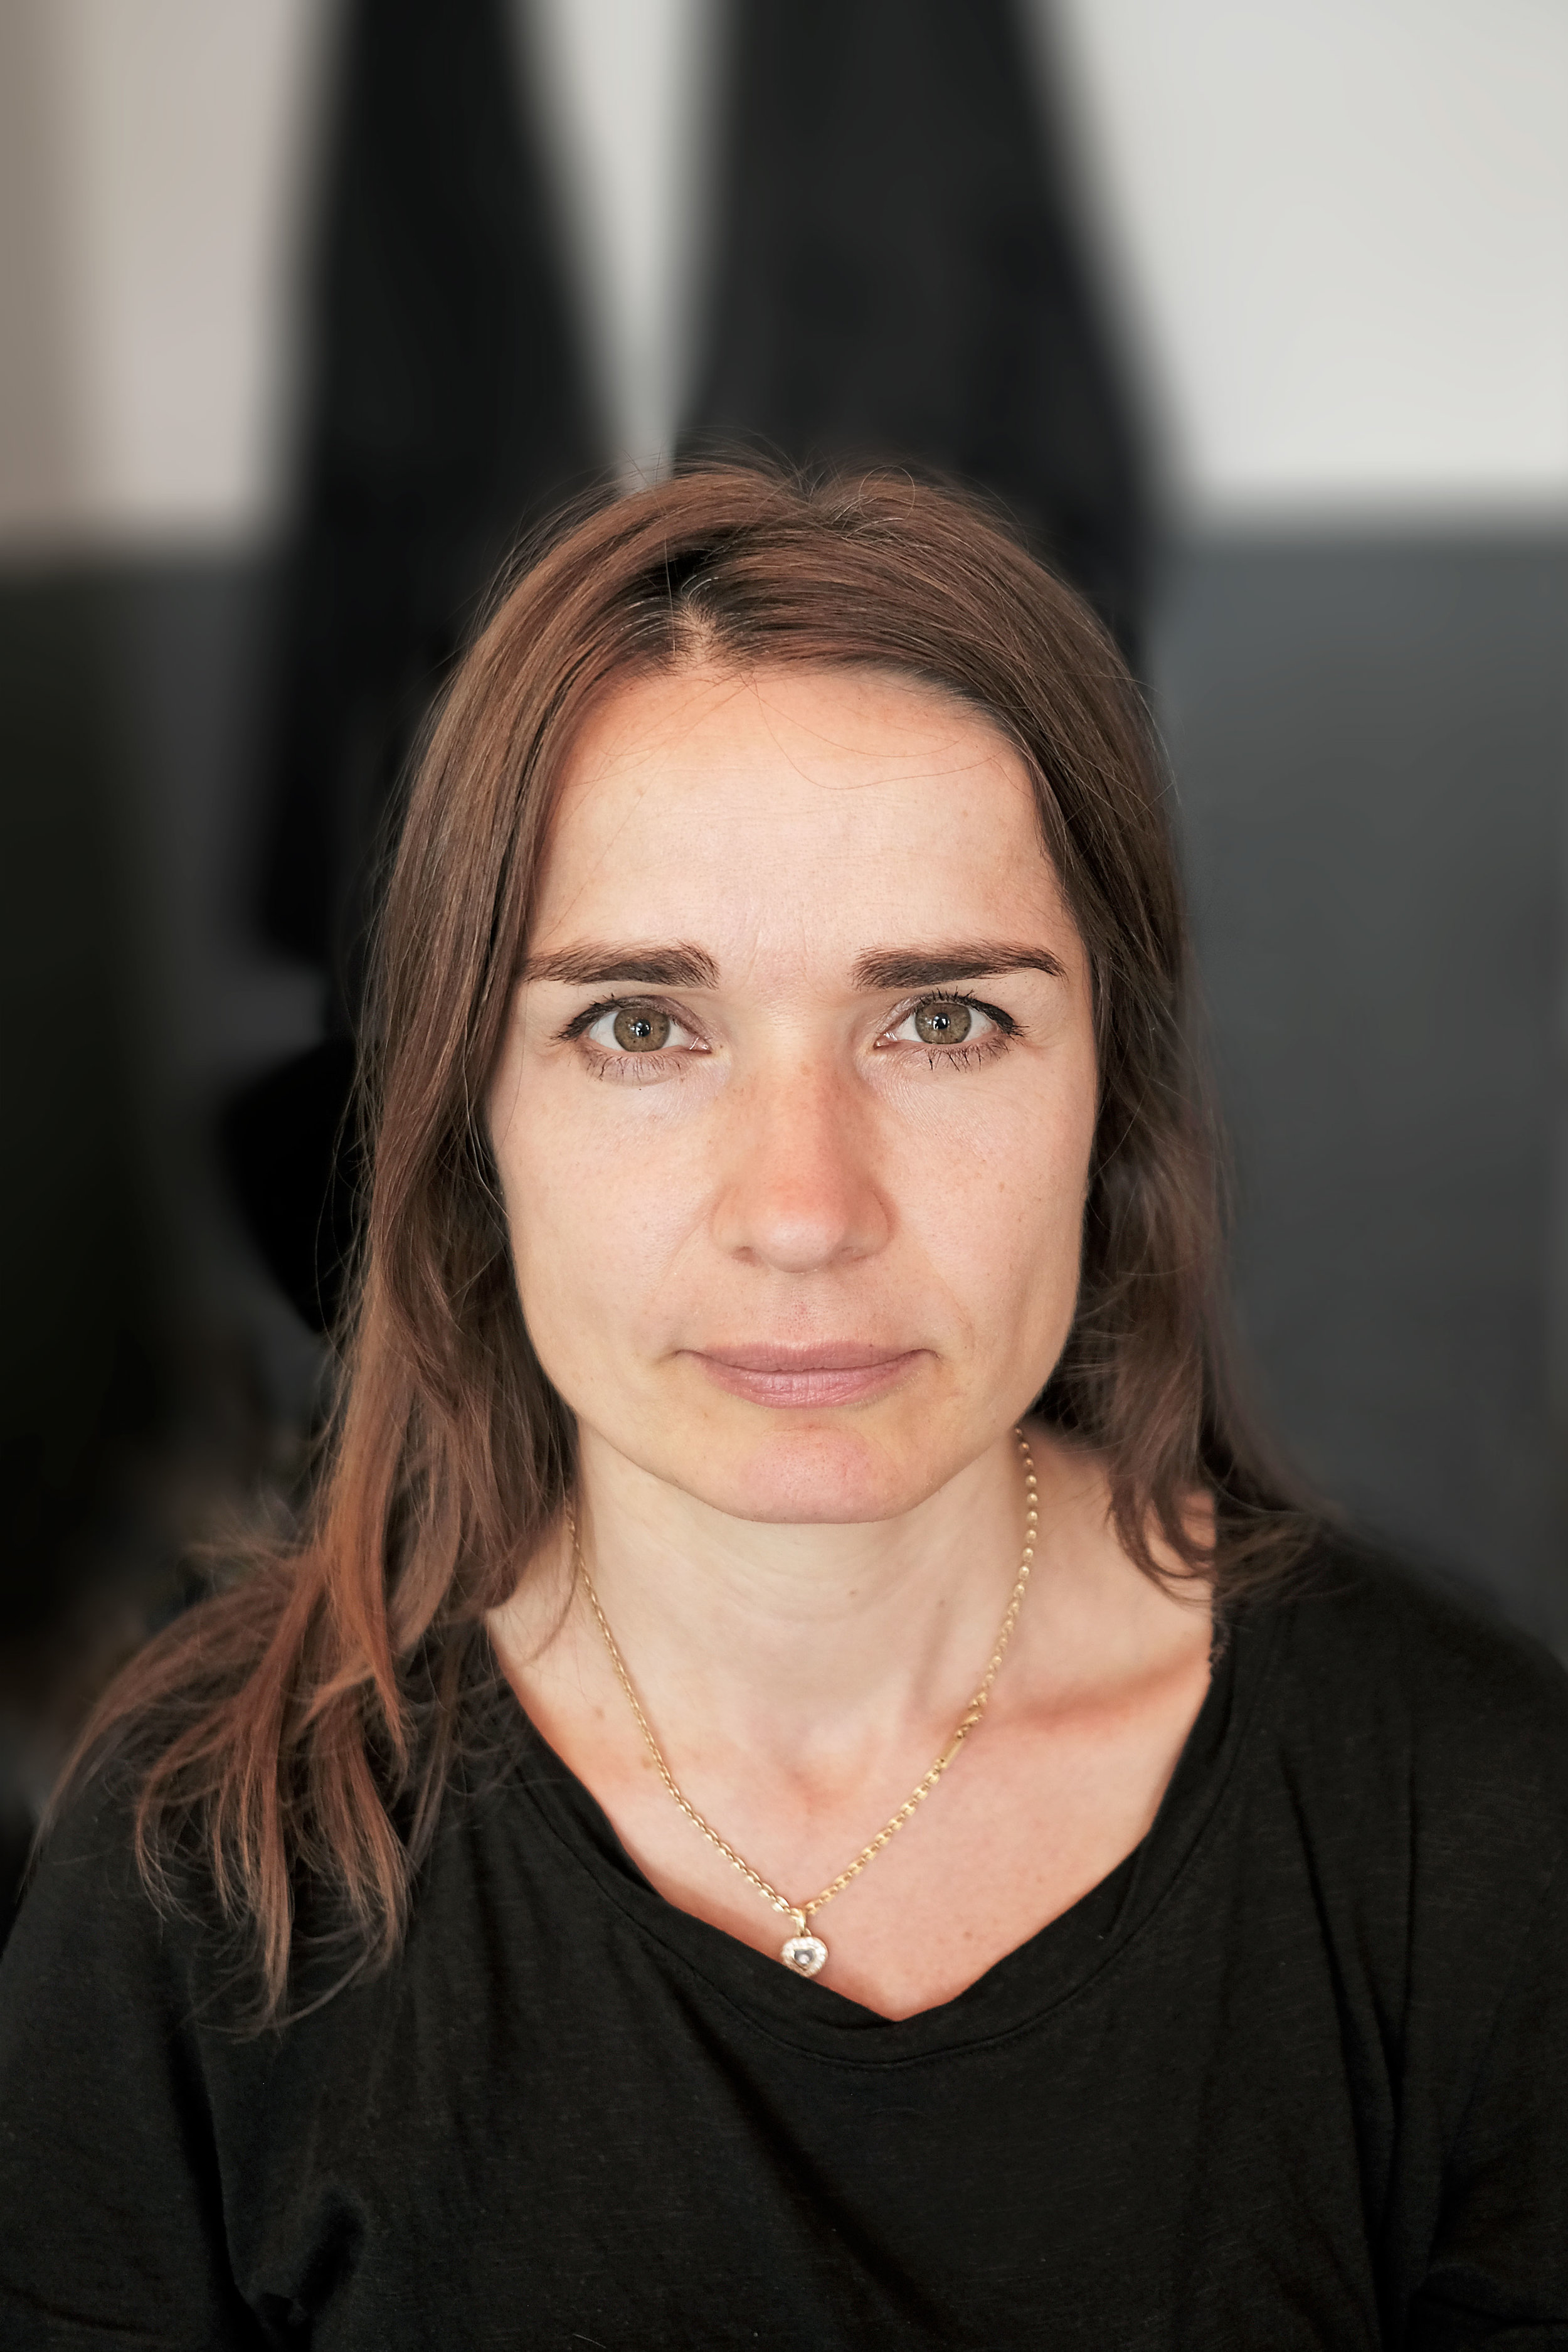 Nora Kym